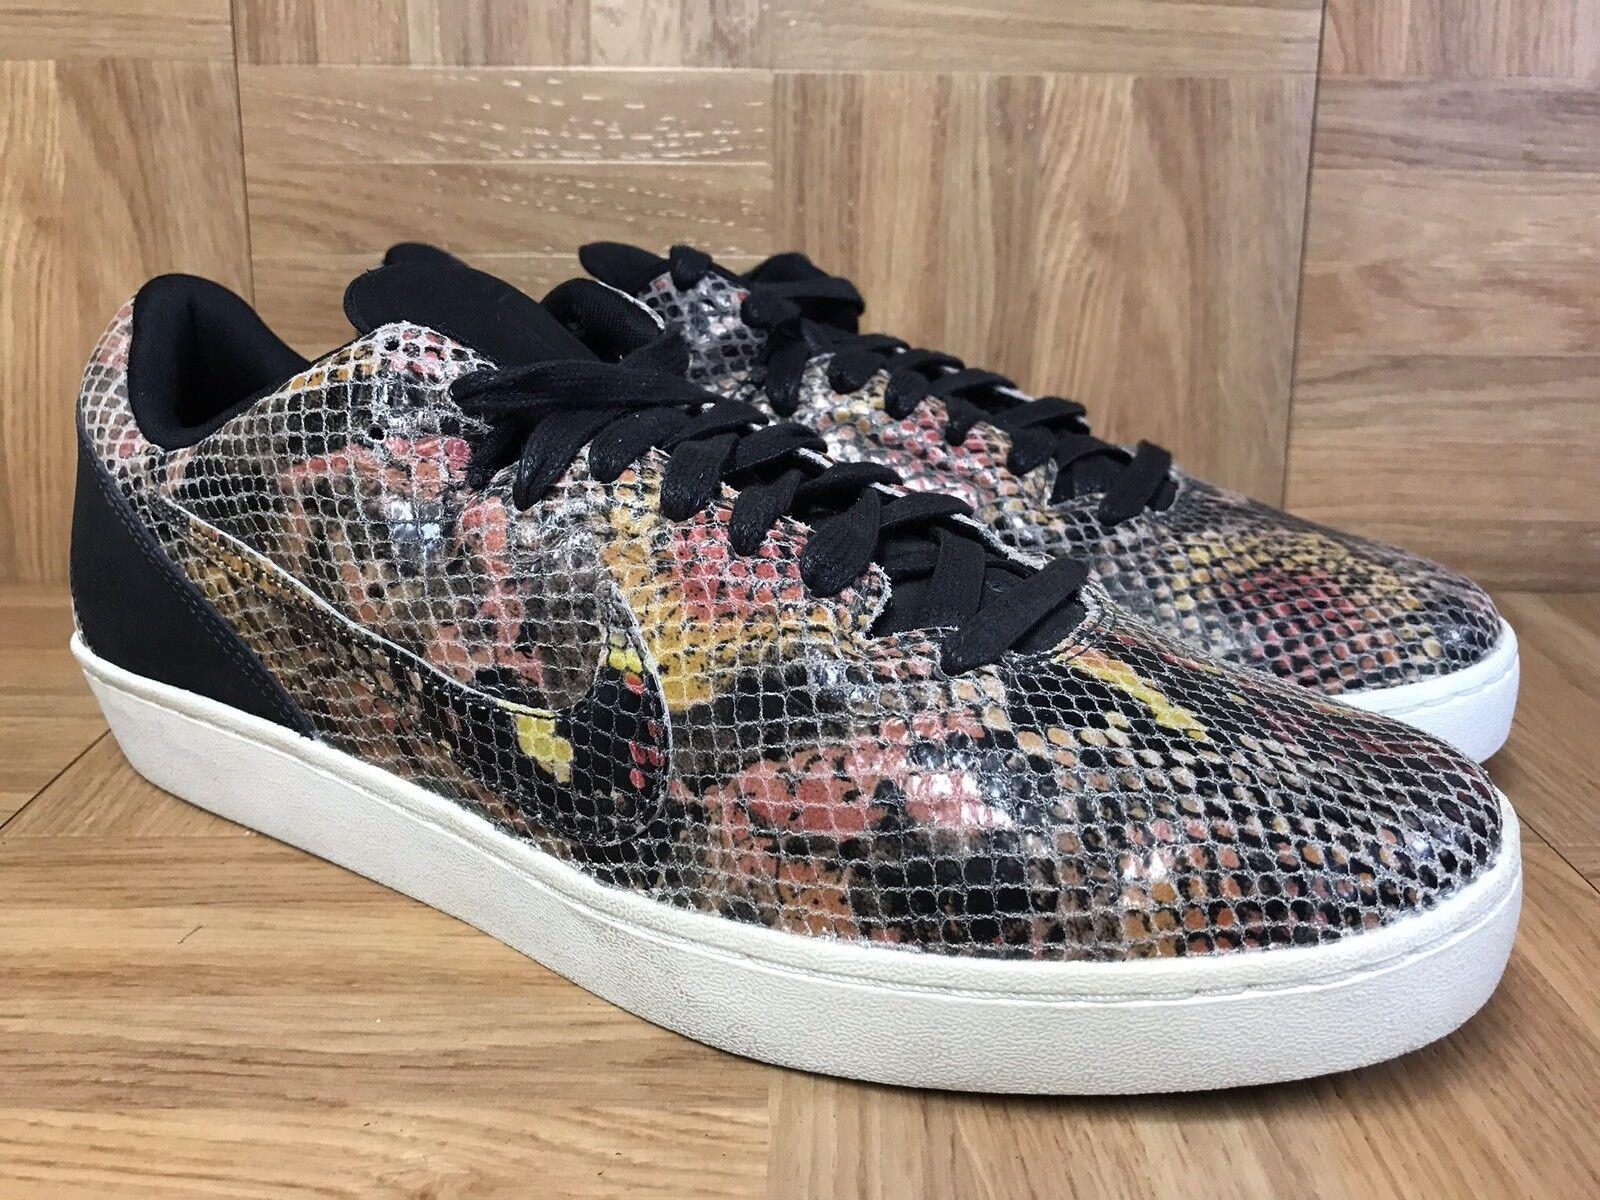 RARE  Nike Kobe 8 VIII NSW Lifestyle Snakeskin Snake Mamba Sz 8 582552-700 MenS